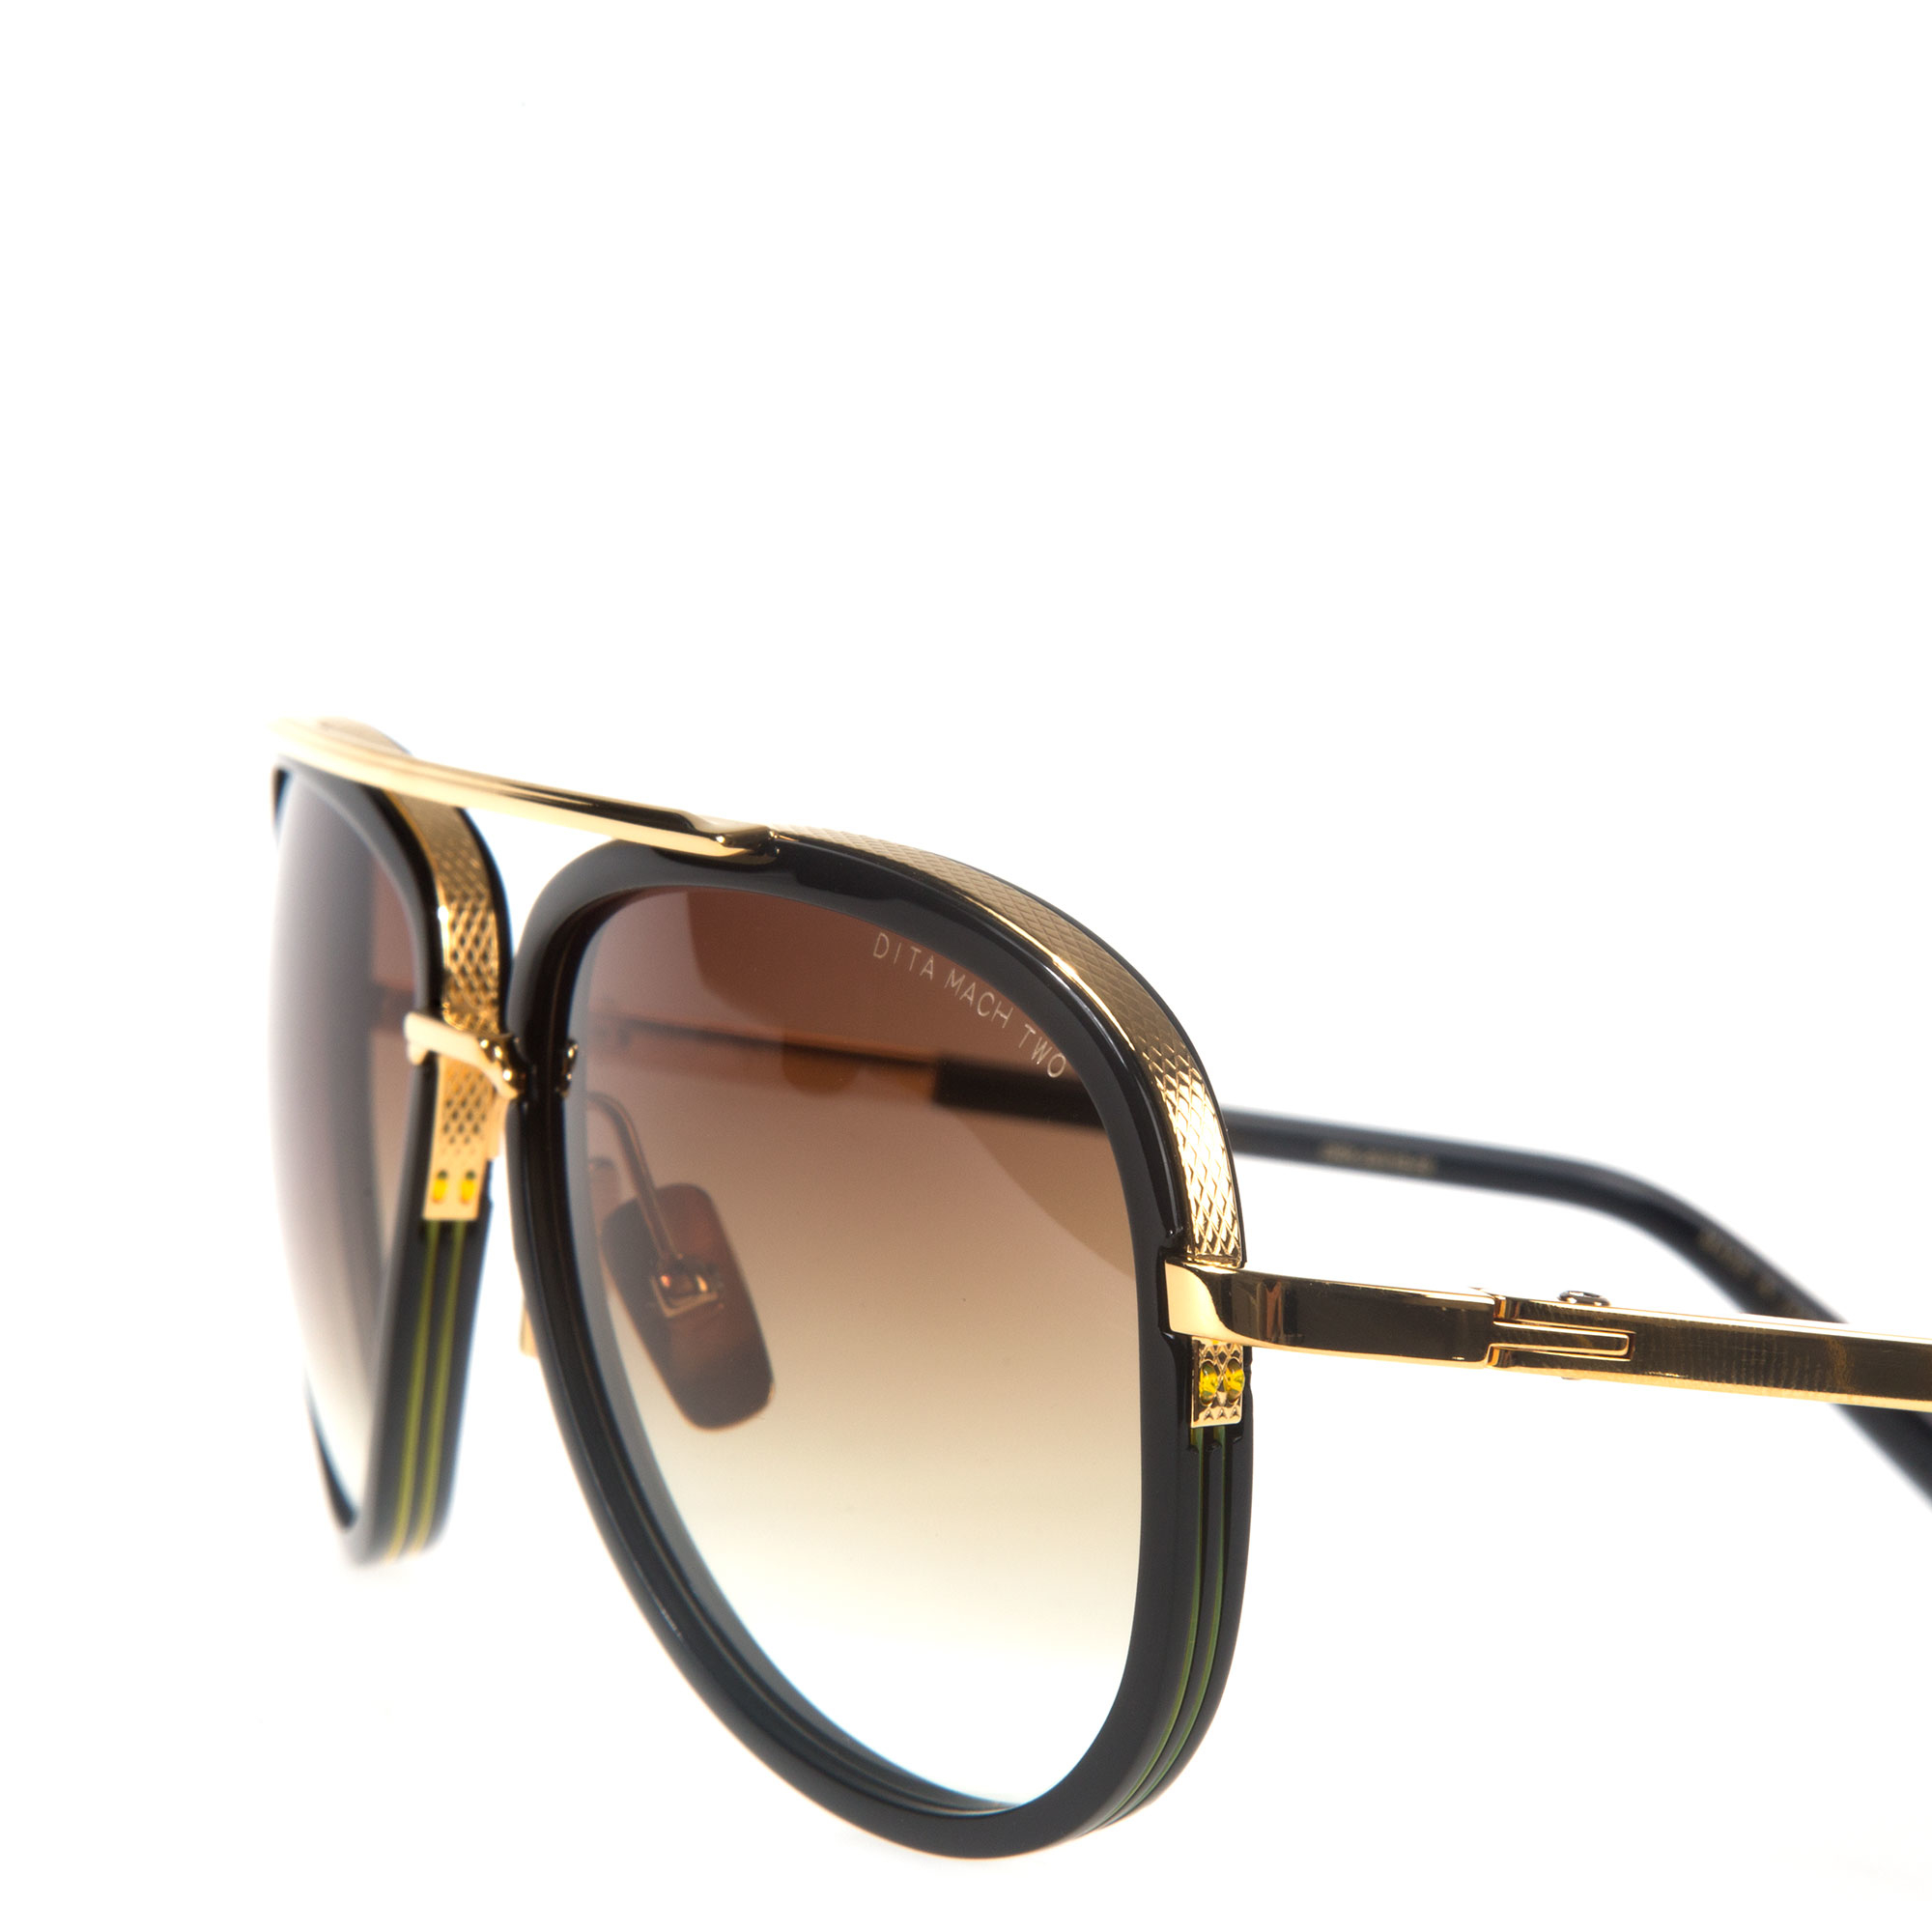 4f47ffd277 Lyst - Dita Eyewear Mach-two Sunglasses in Brown for Men